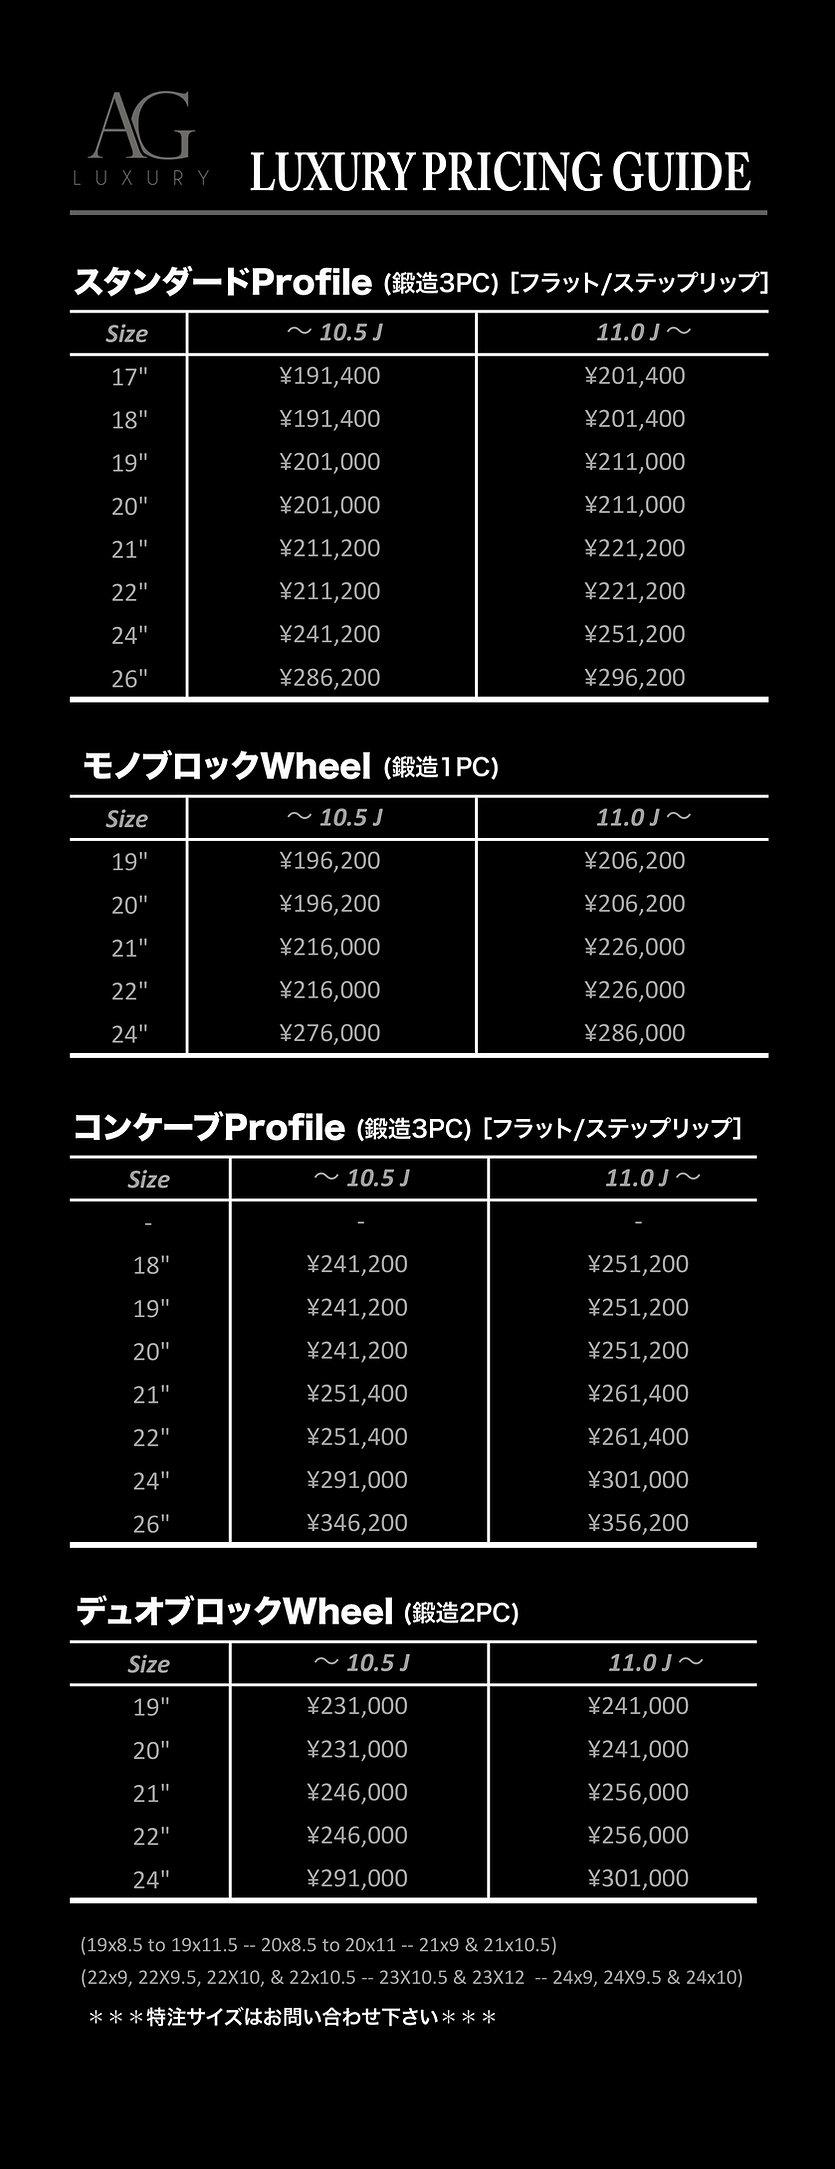 JPEGプライスリスト【AGL】.jpg